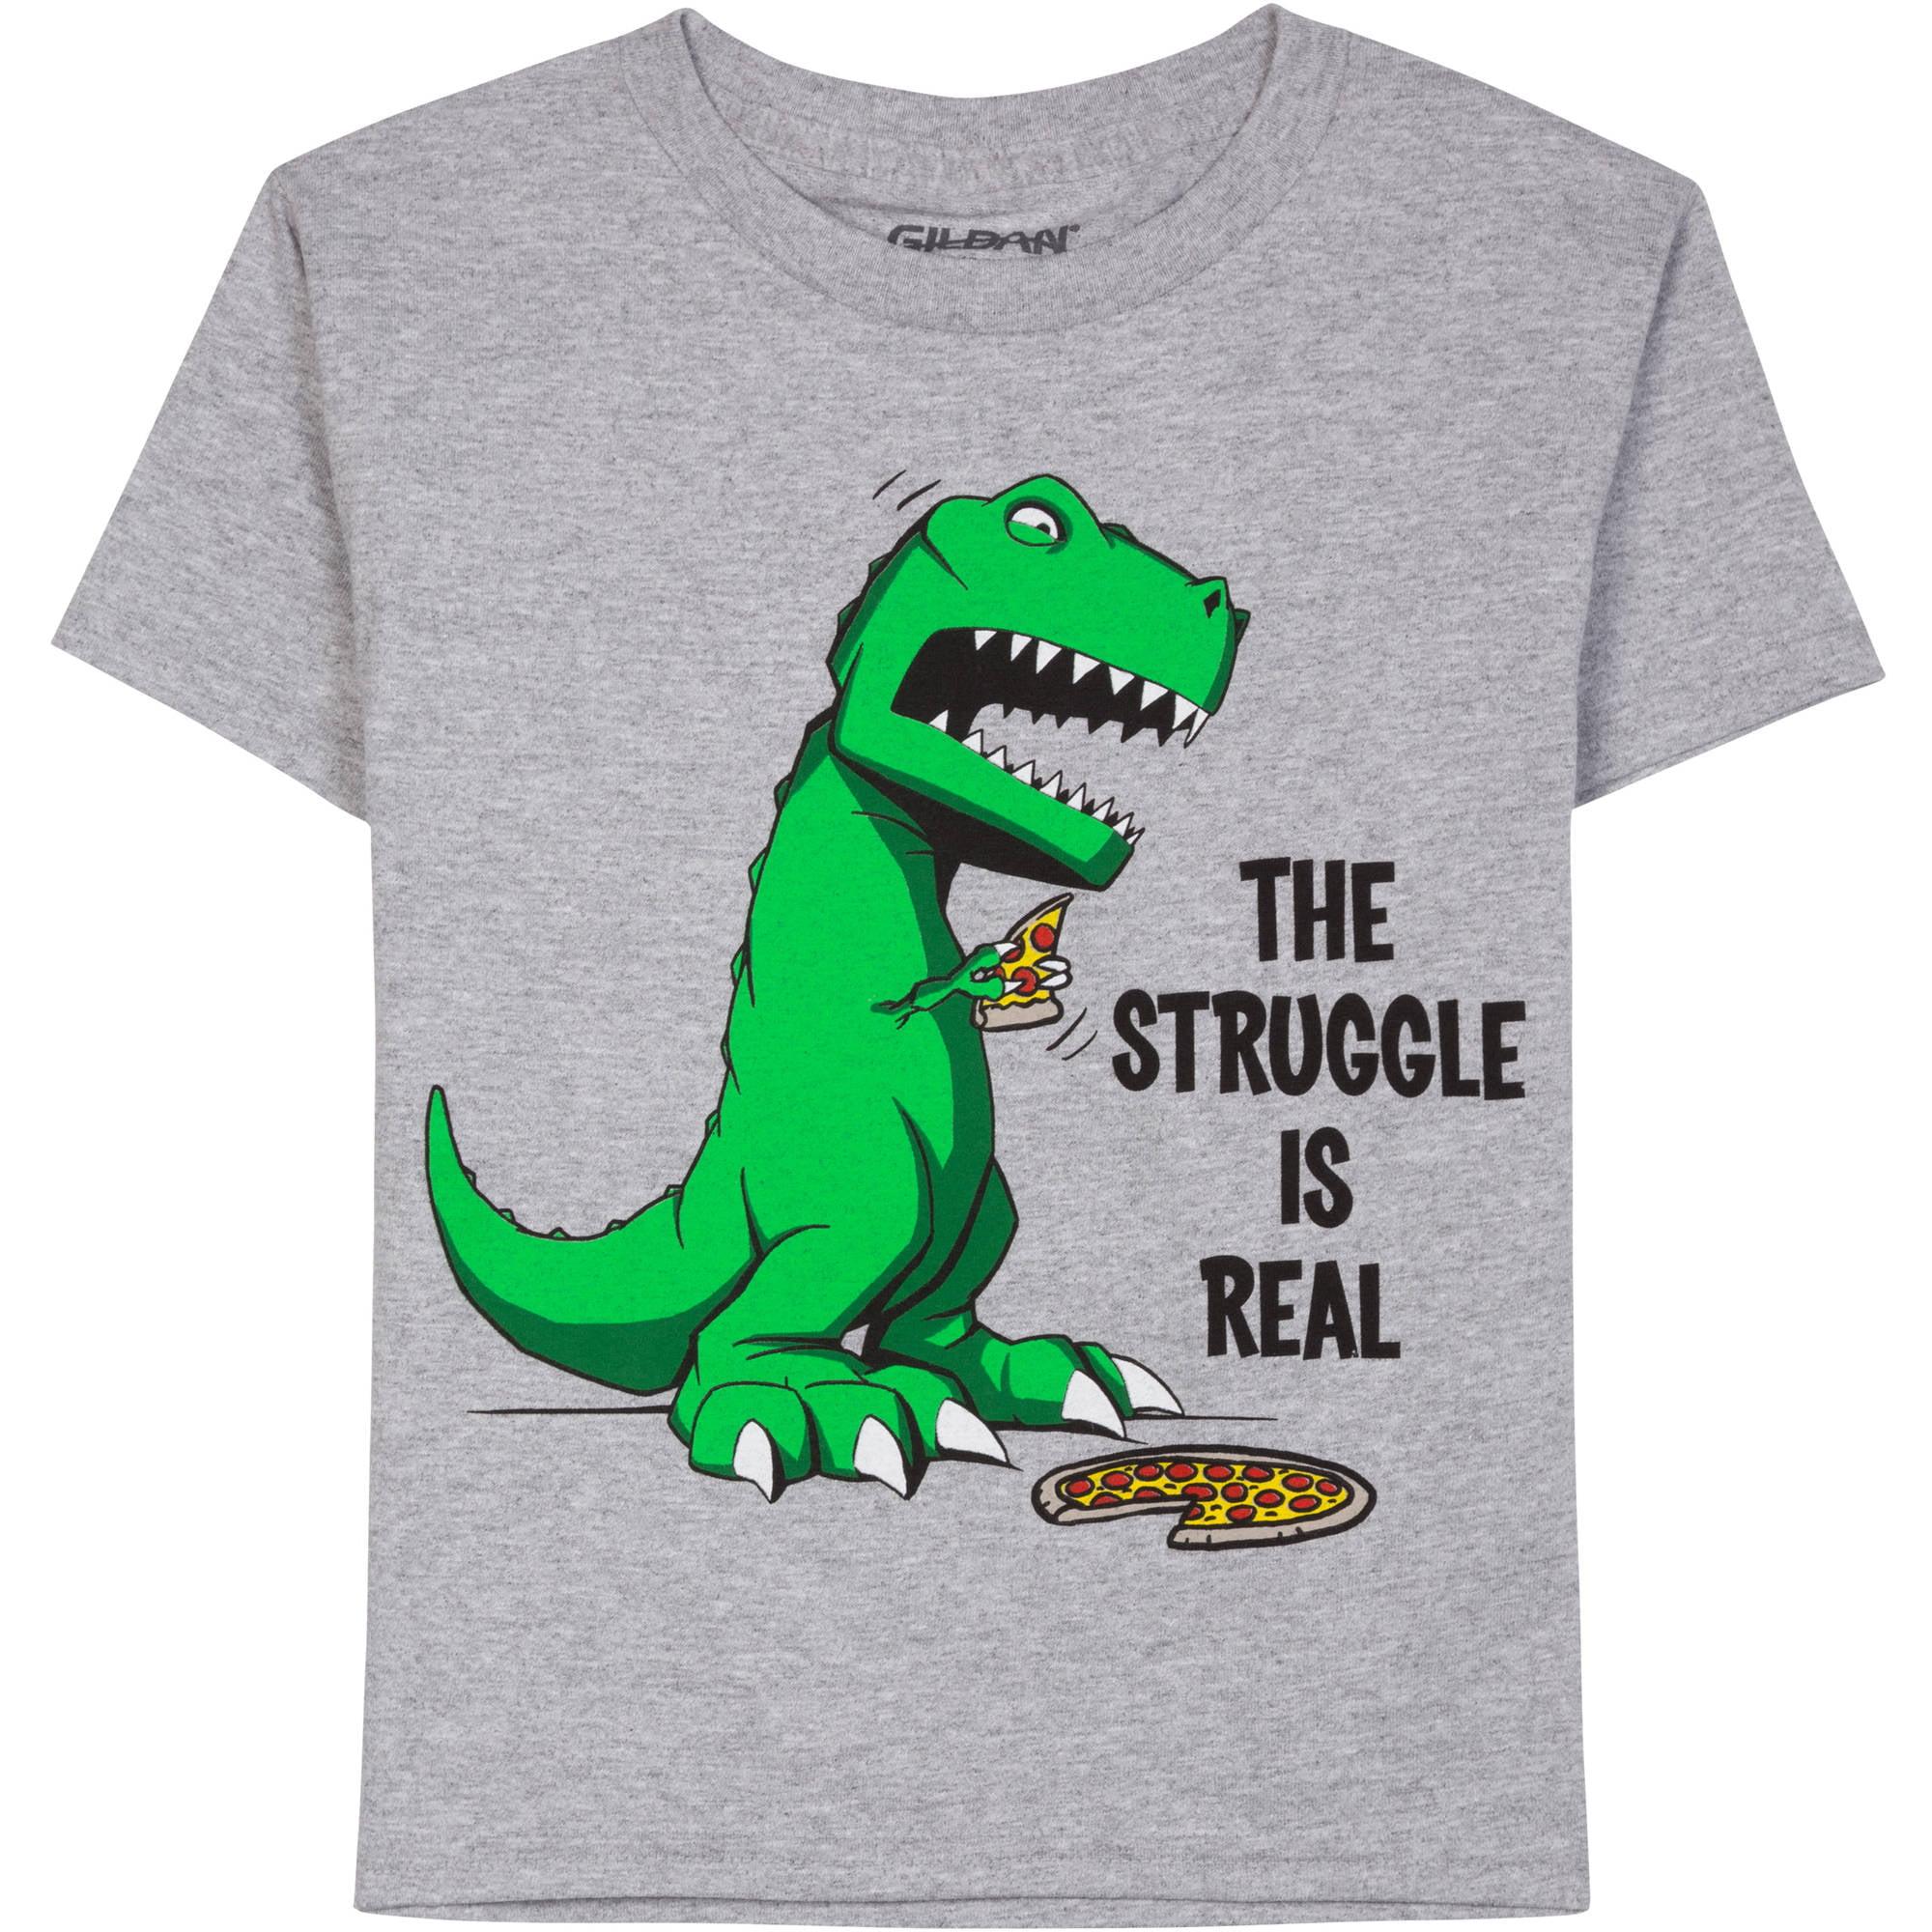 ffbd1535ec0 gildan - Boys Pizza Struggle Humor Short Sleeve Graphic Tee - Walmart.com